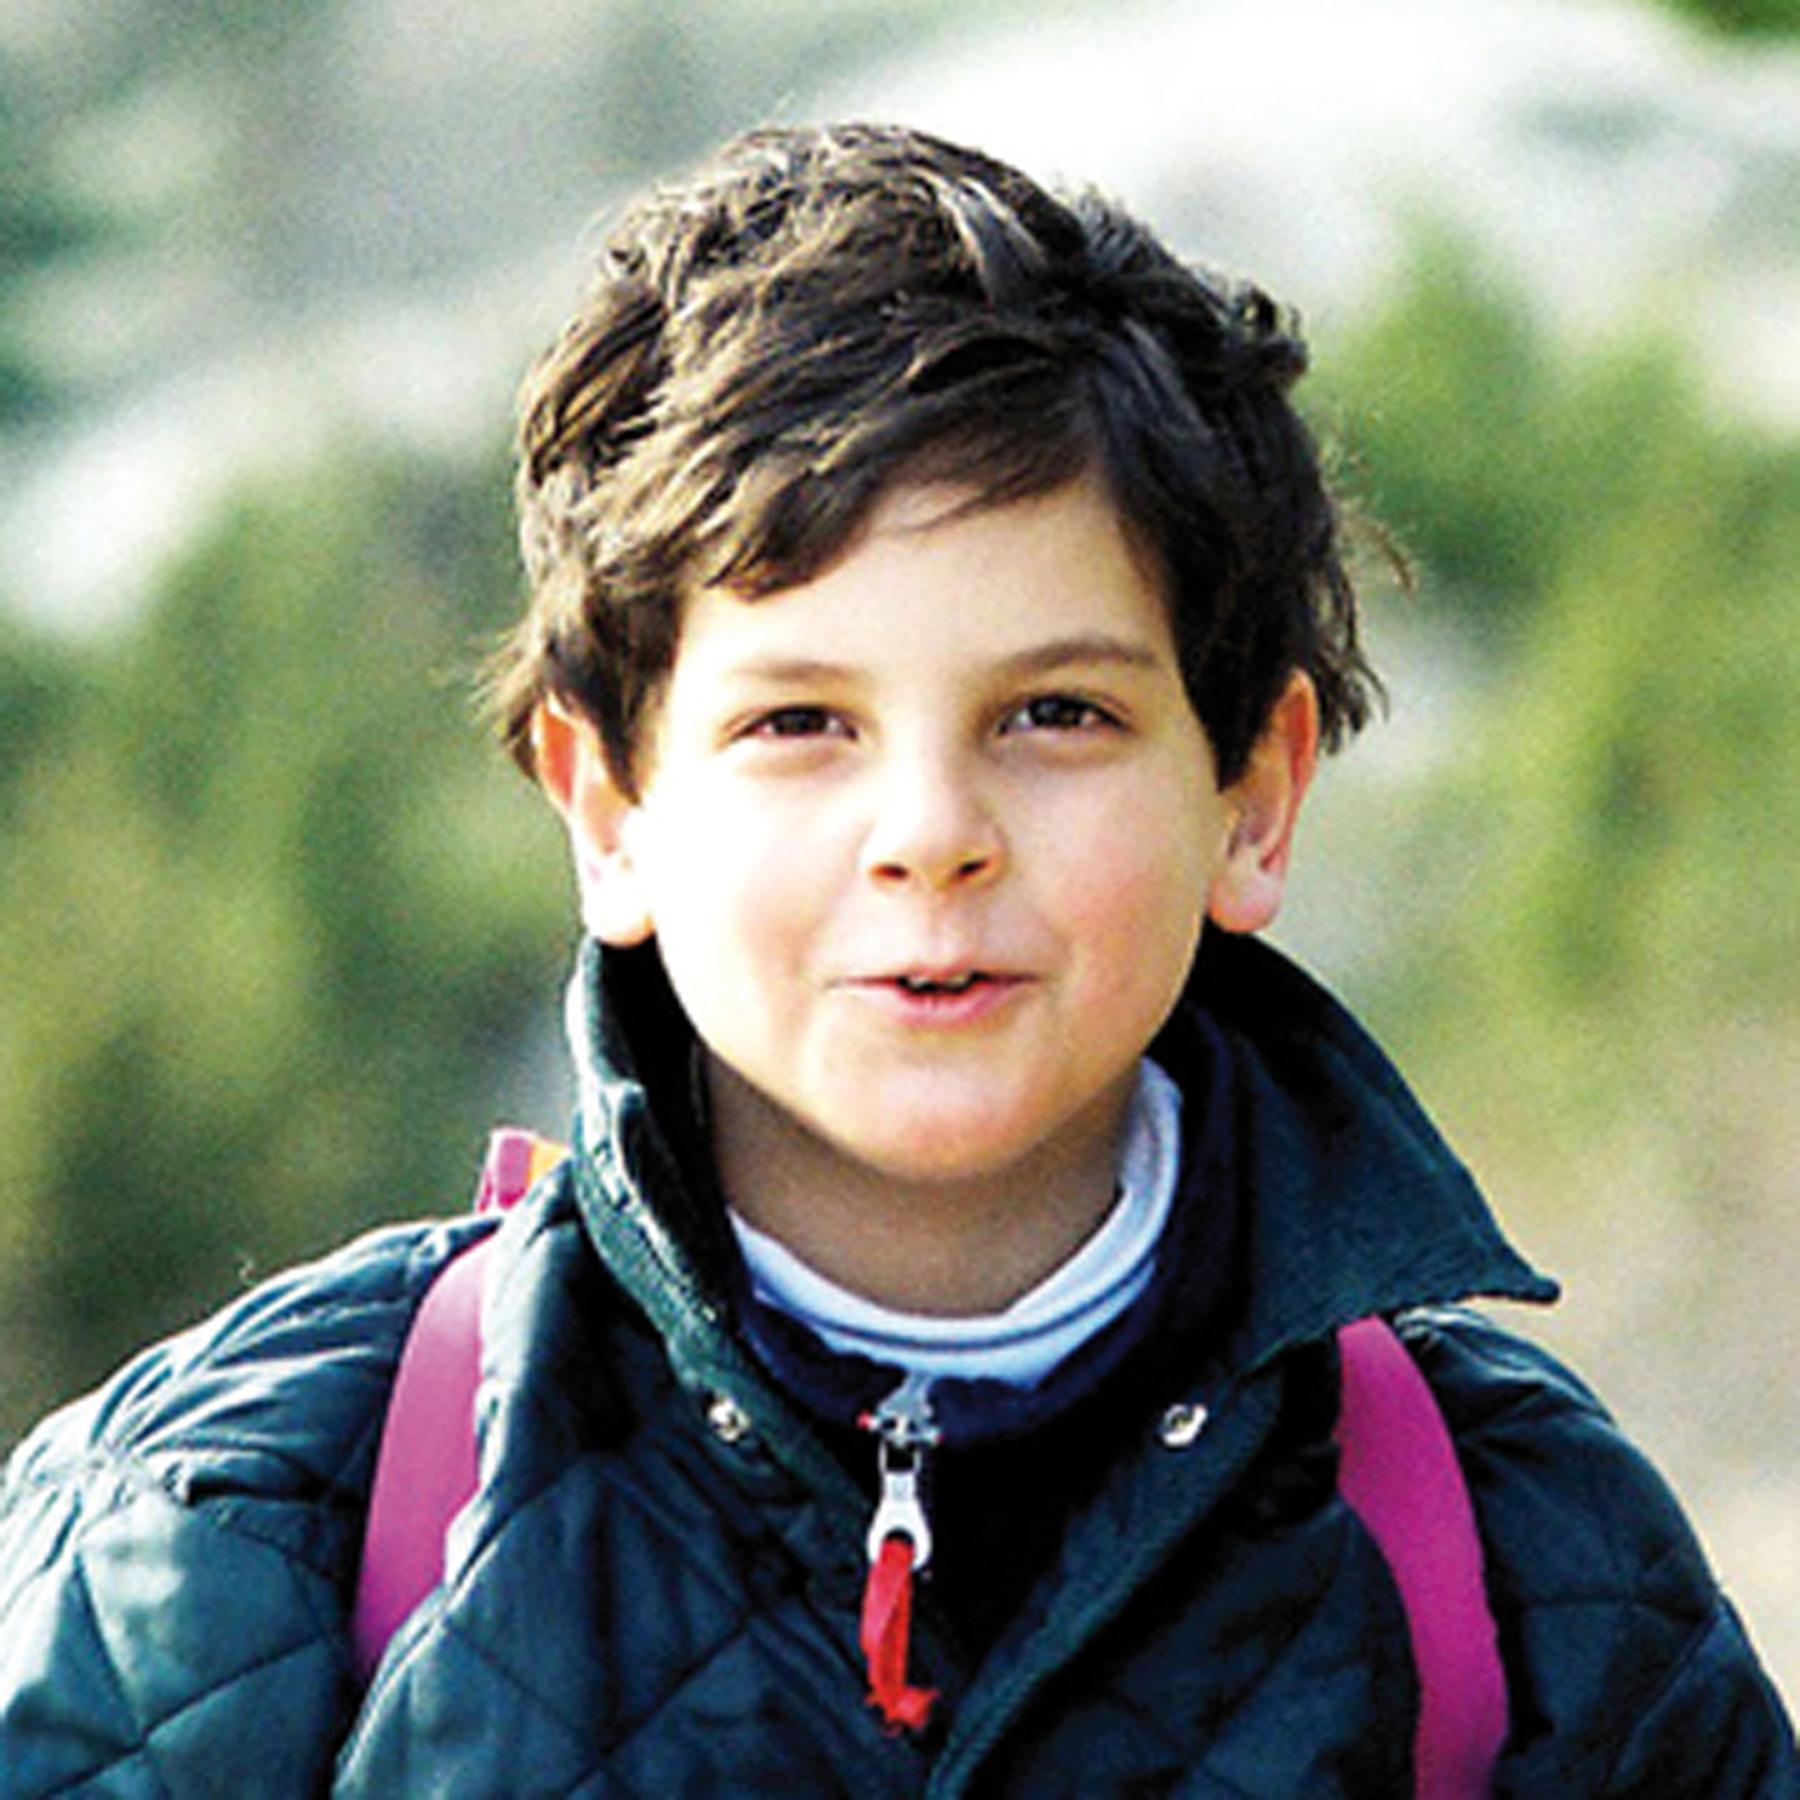 Carlo Acutis, le futur chouchou des œuvres de jeunesse ?